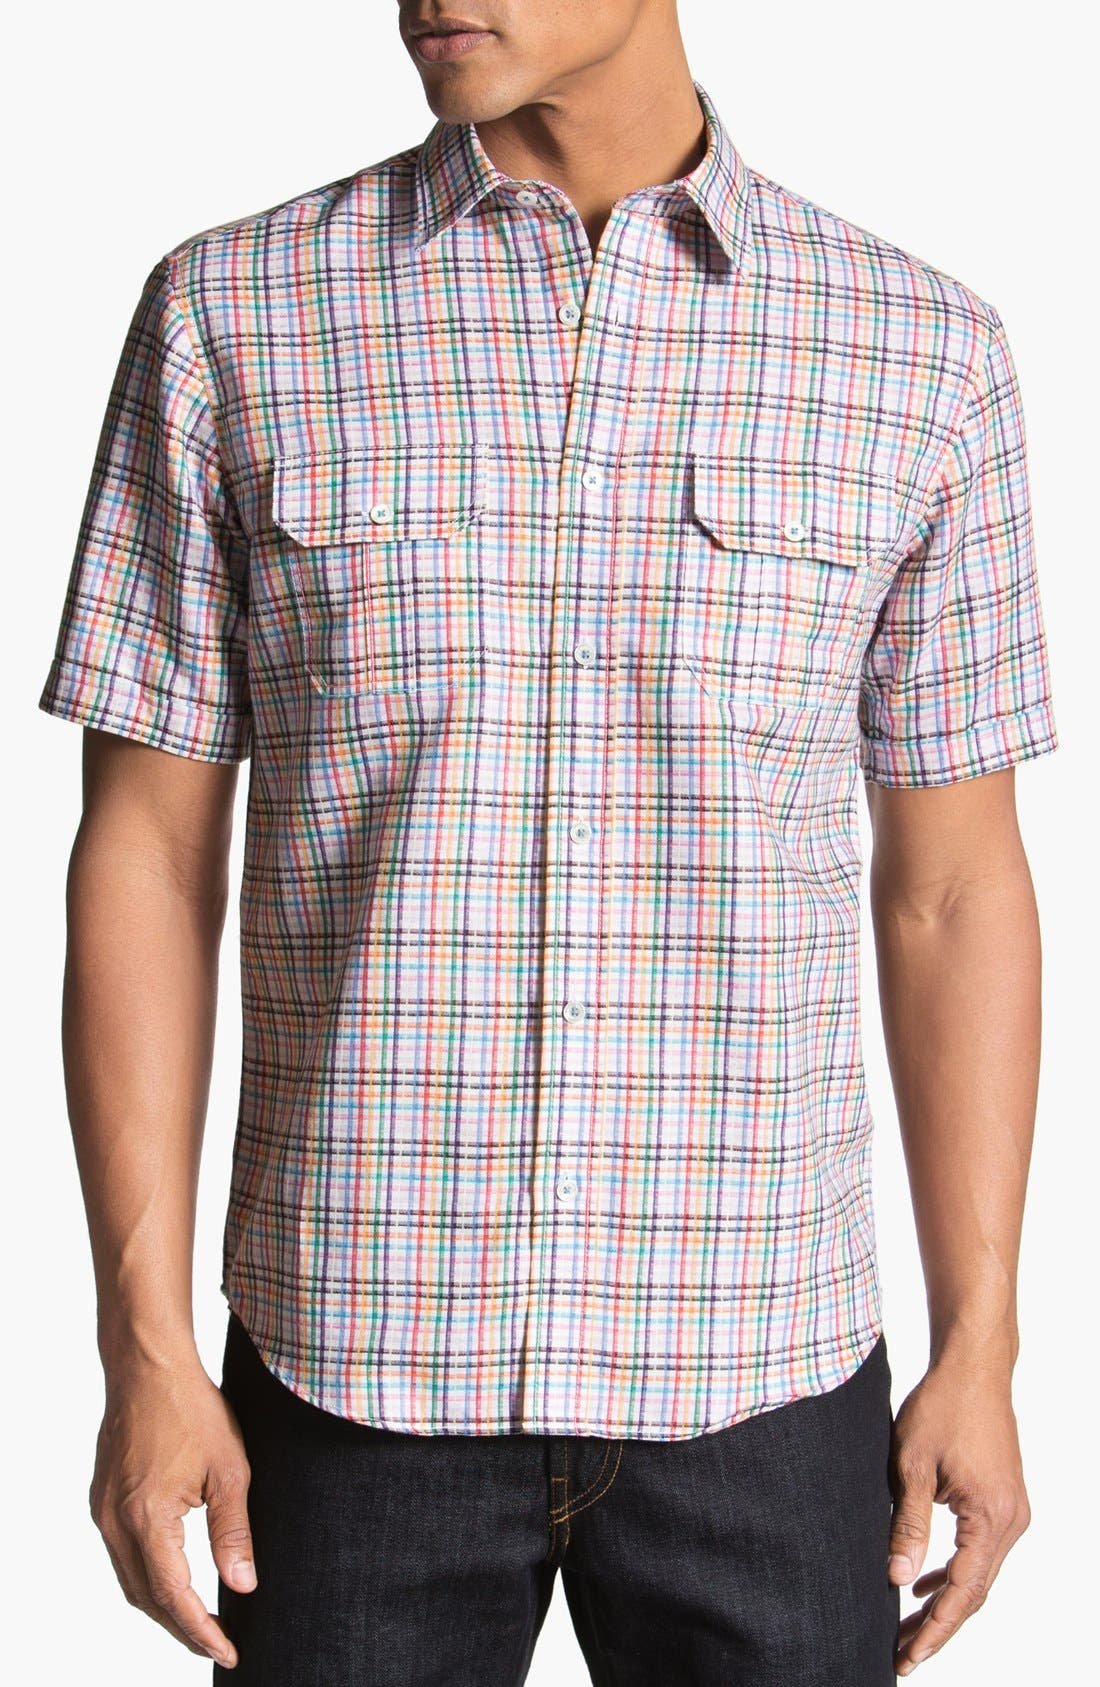 Alternate Image 1 Selected - BUGATCHI Shaped Fit Short Sleeve Linen Sport Shirt